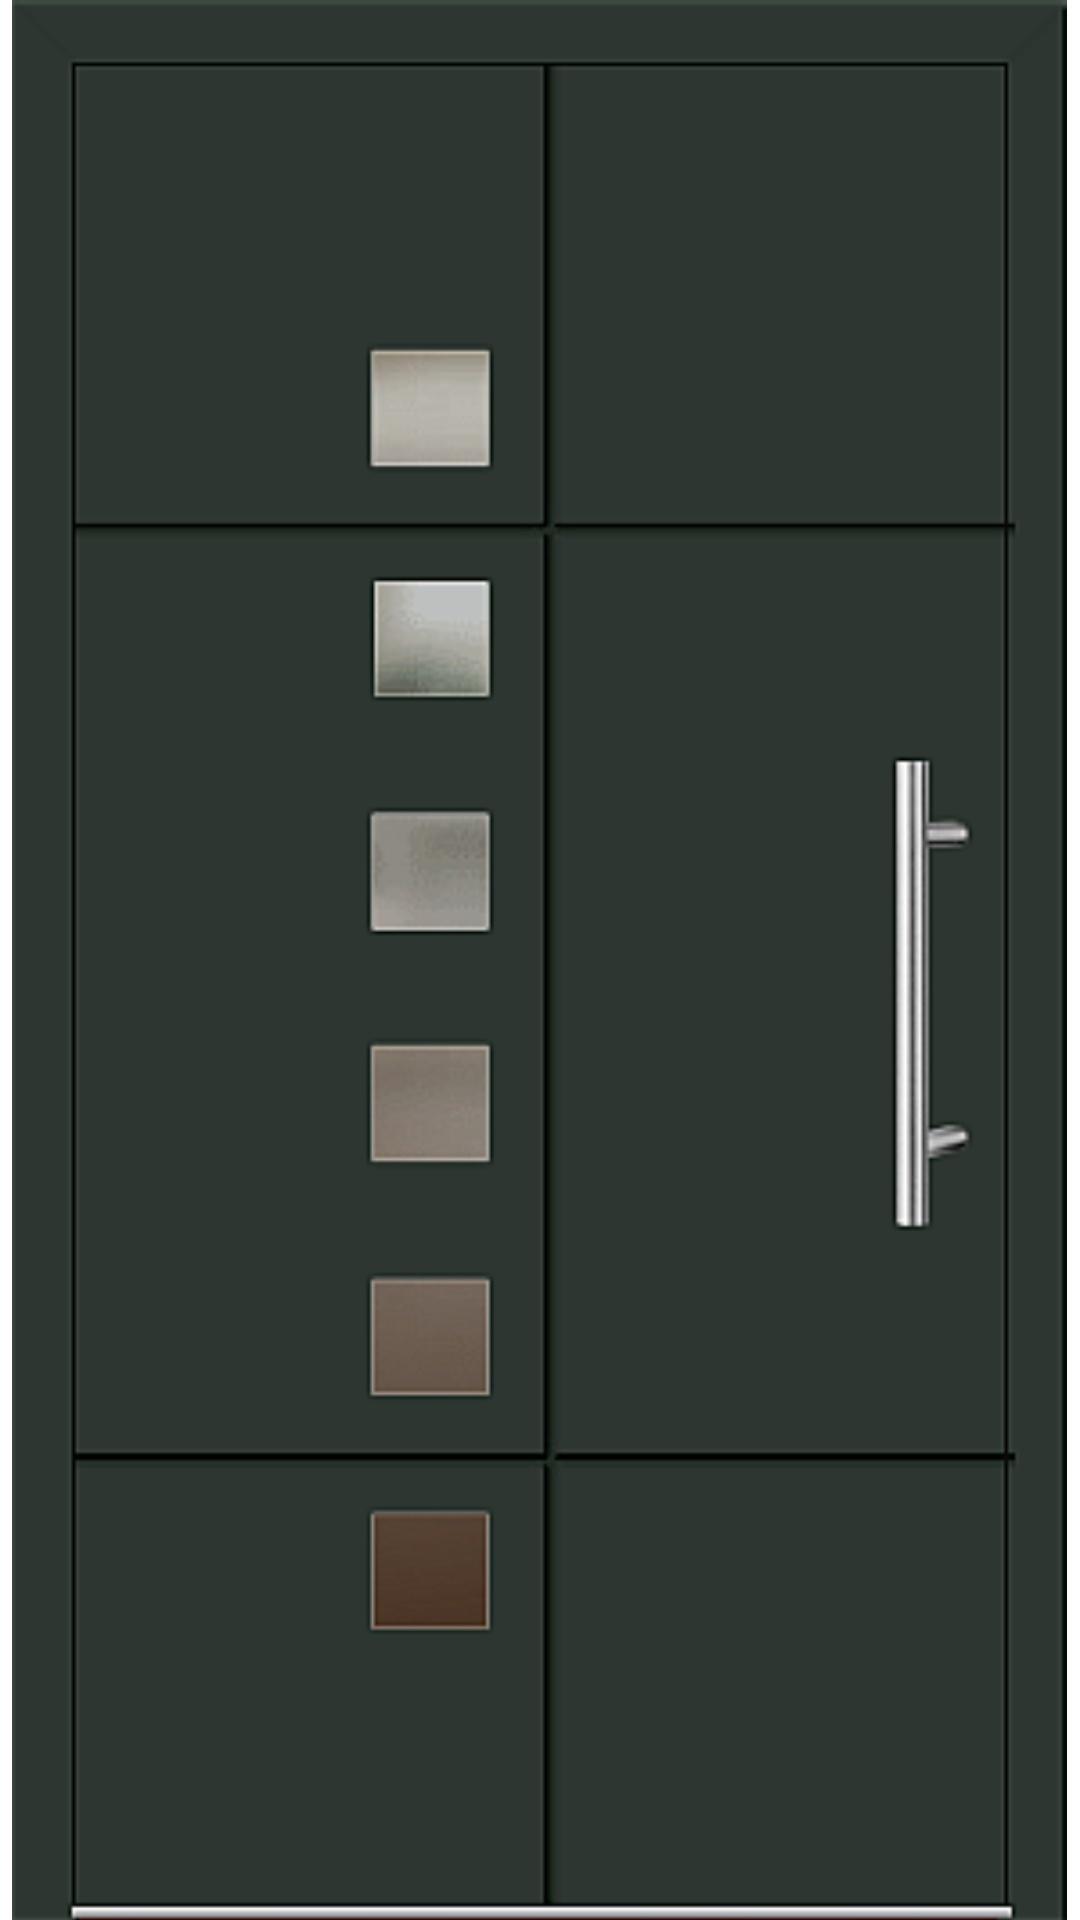 Aluminium Haustür Modell 6534-52 tannengrün